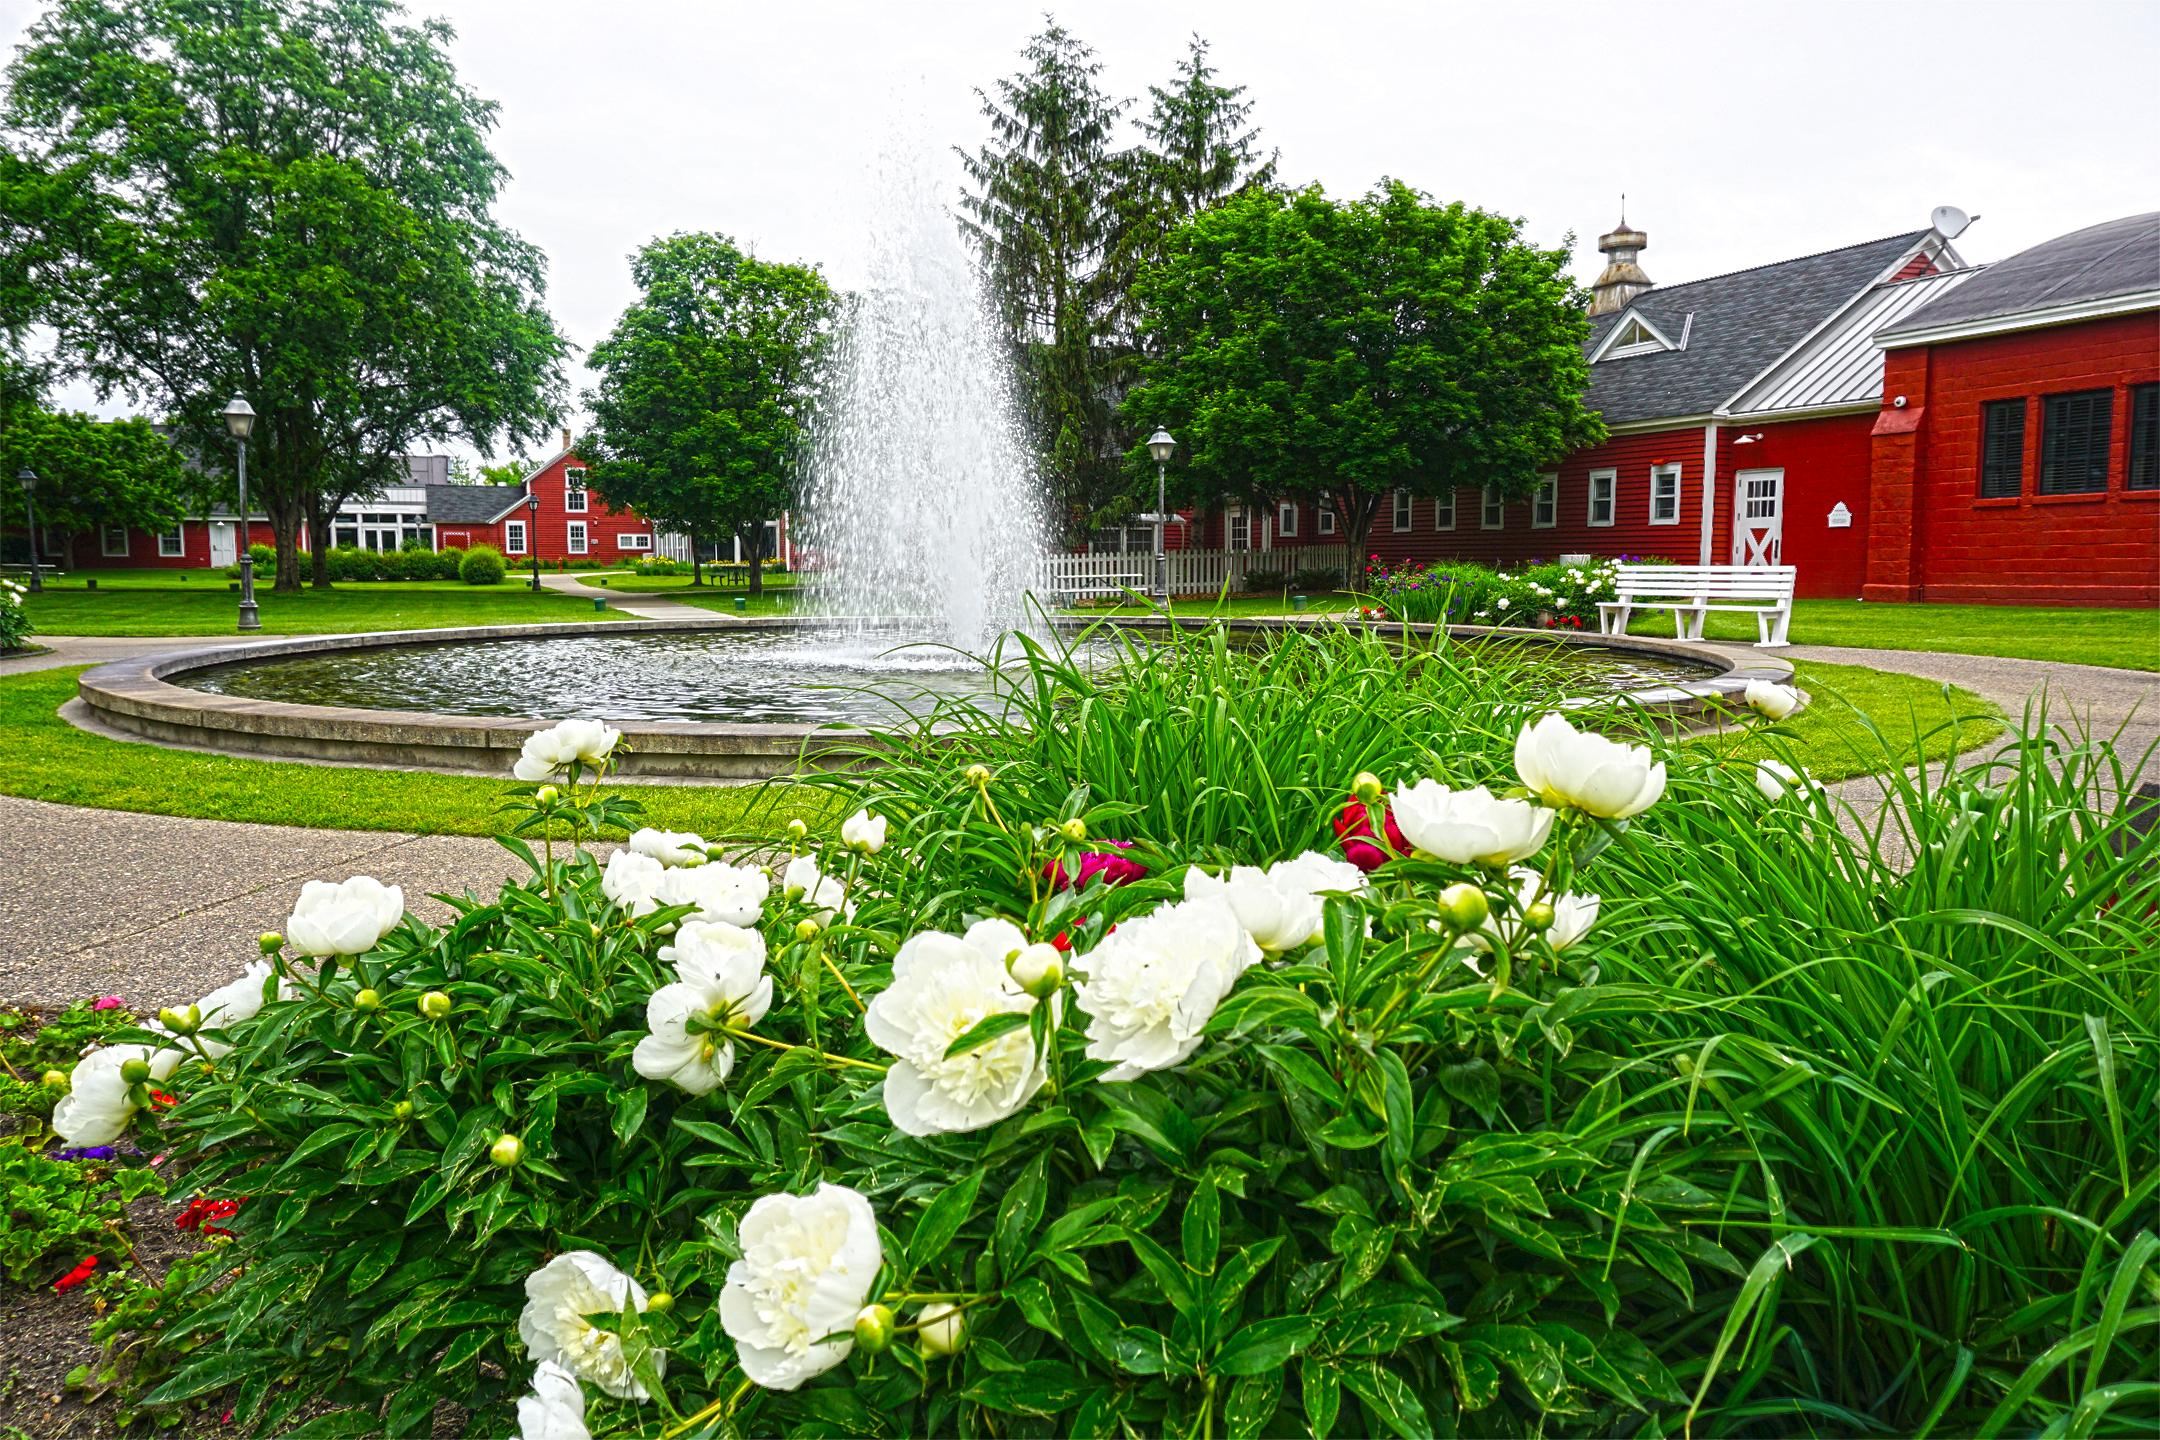 Large fountain in garden